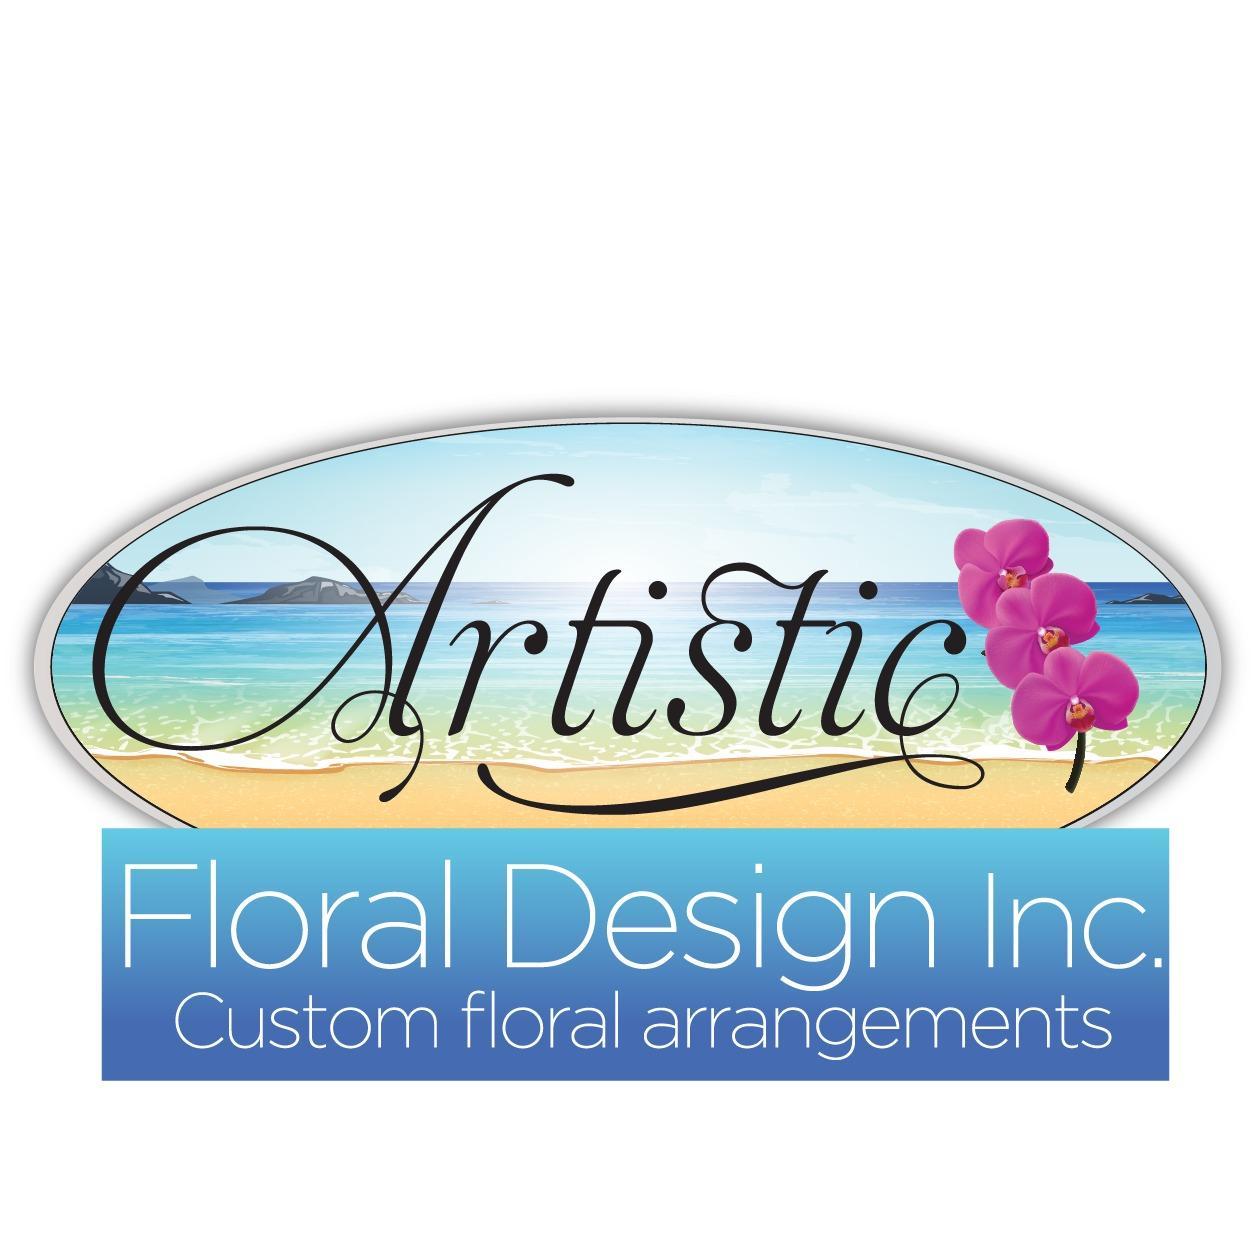 Artistic Floral Design Inc